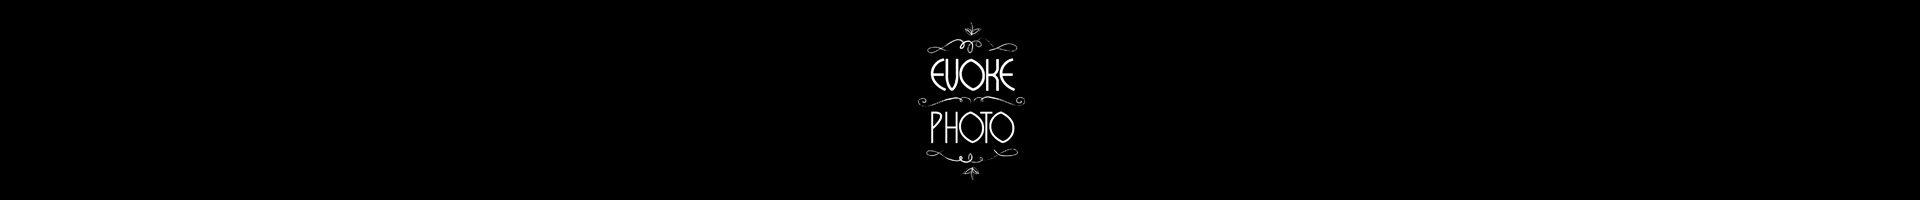 Evoke Photo Blog